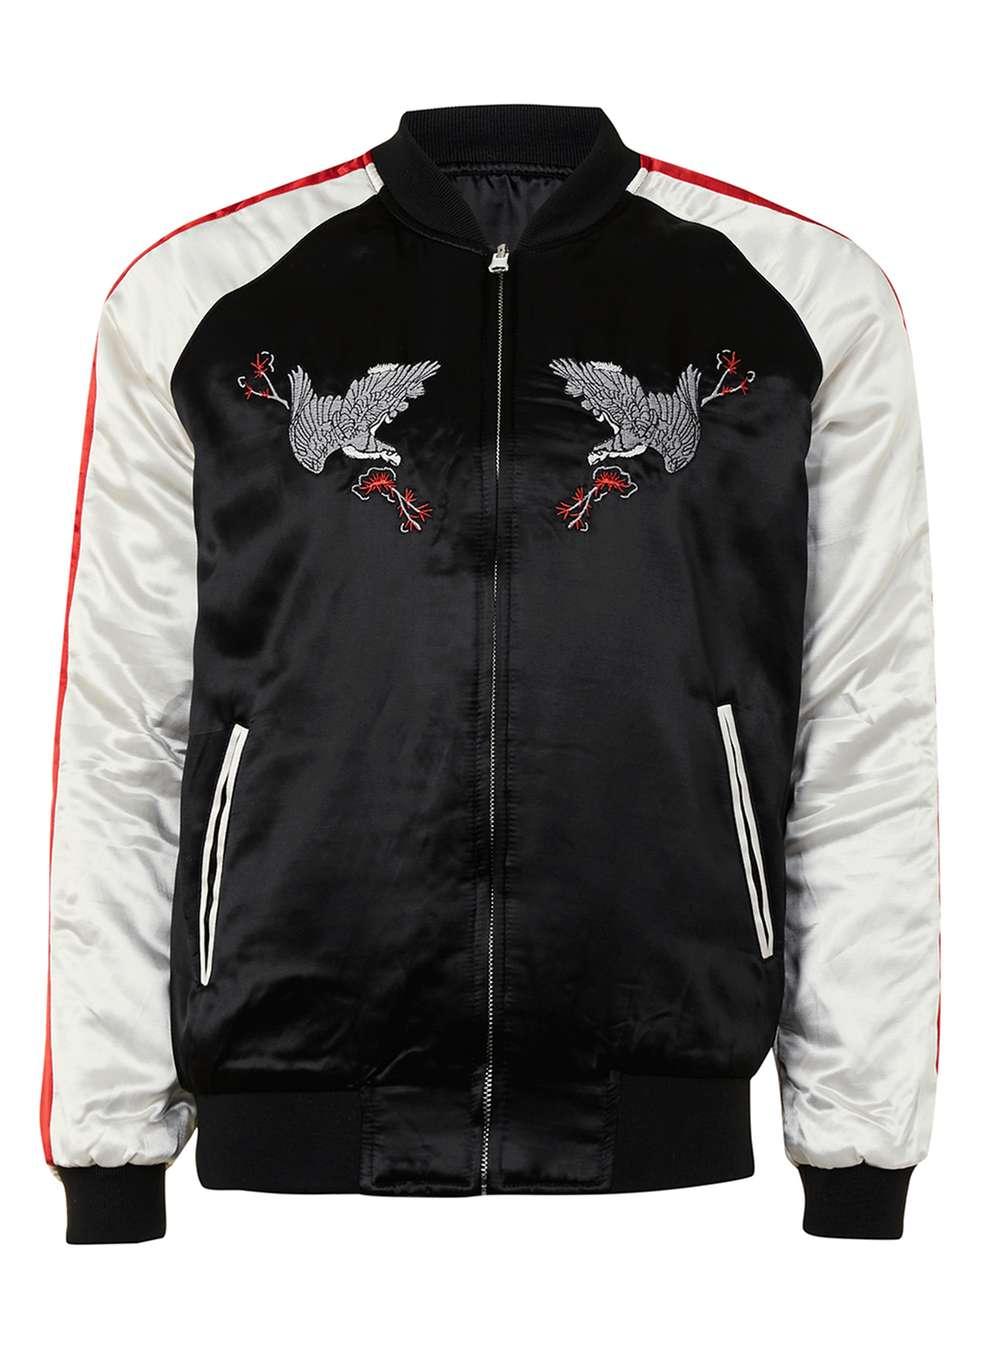 souvenir-bomber-jacket-from-topman